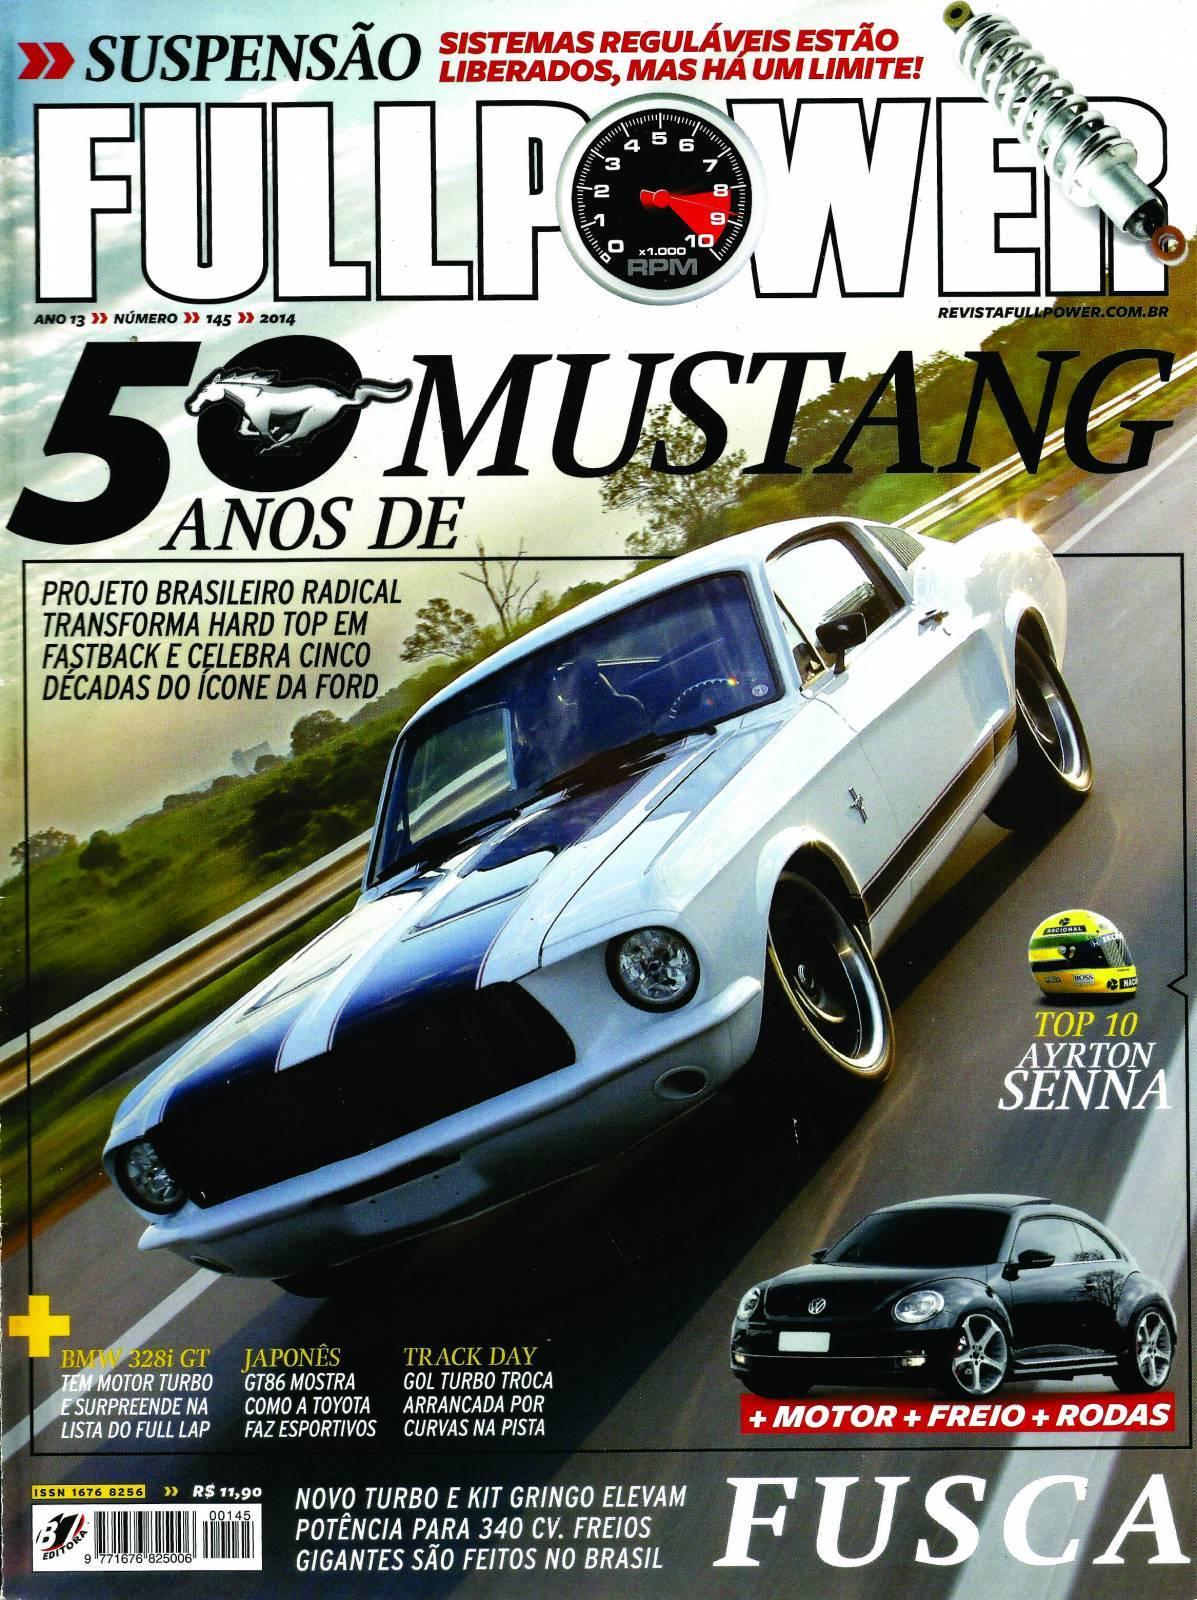 REVISTA FULLPOWER No. 145 ANO 2014 - Loja FullPower